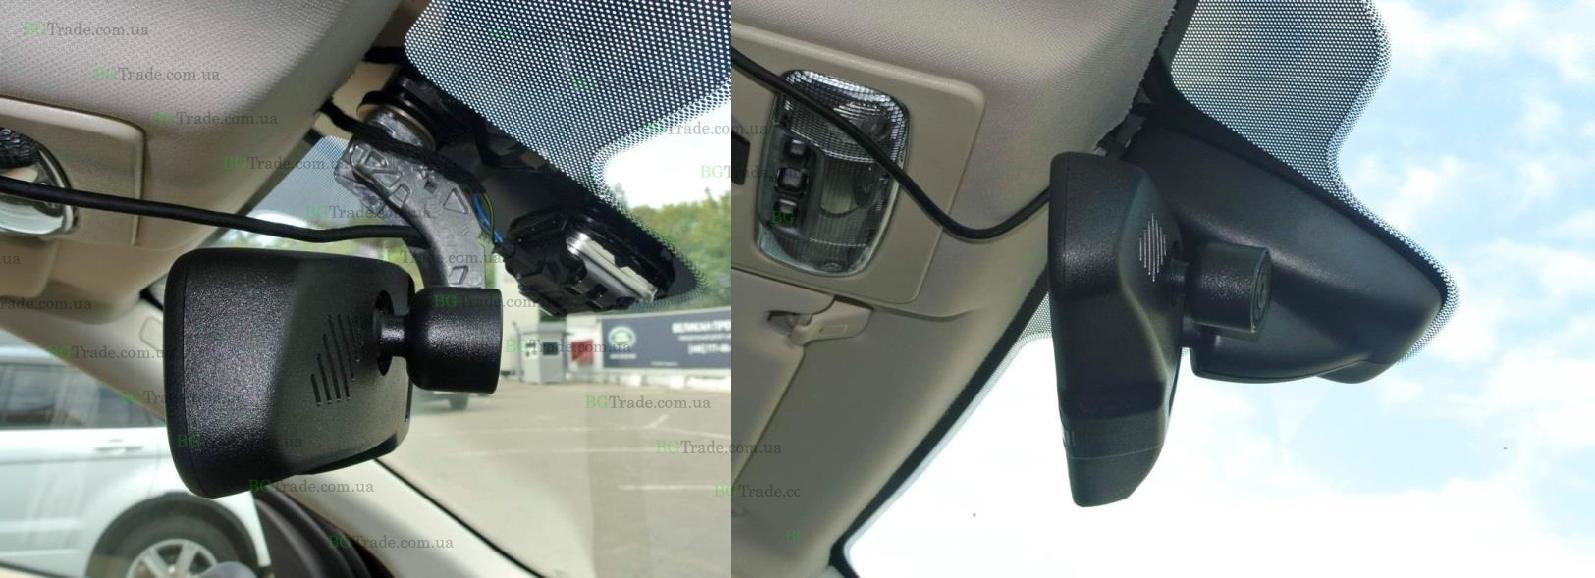 Зеркало видеорегистратор на Land Rover